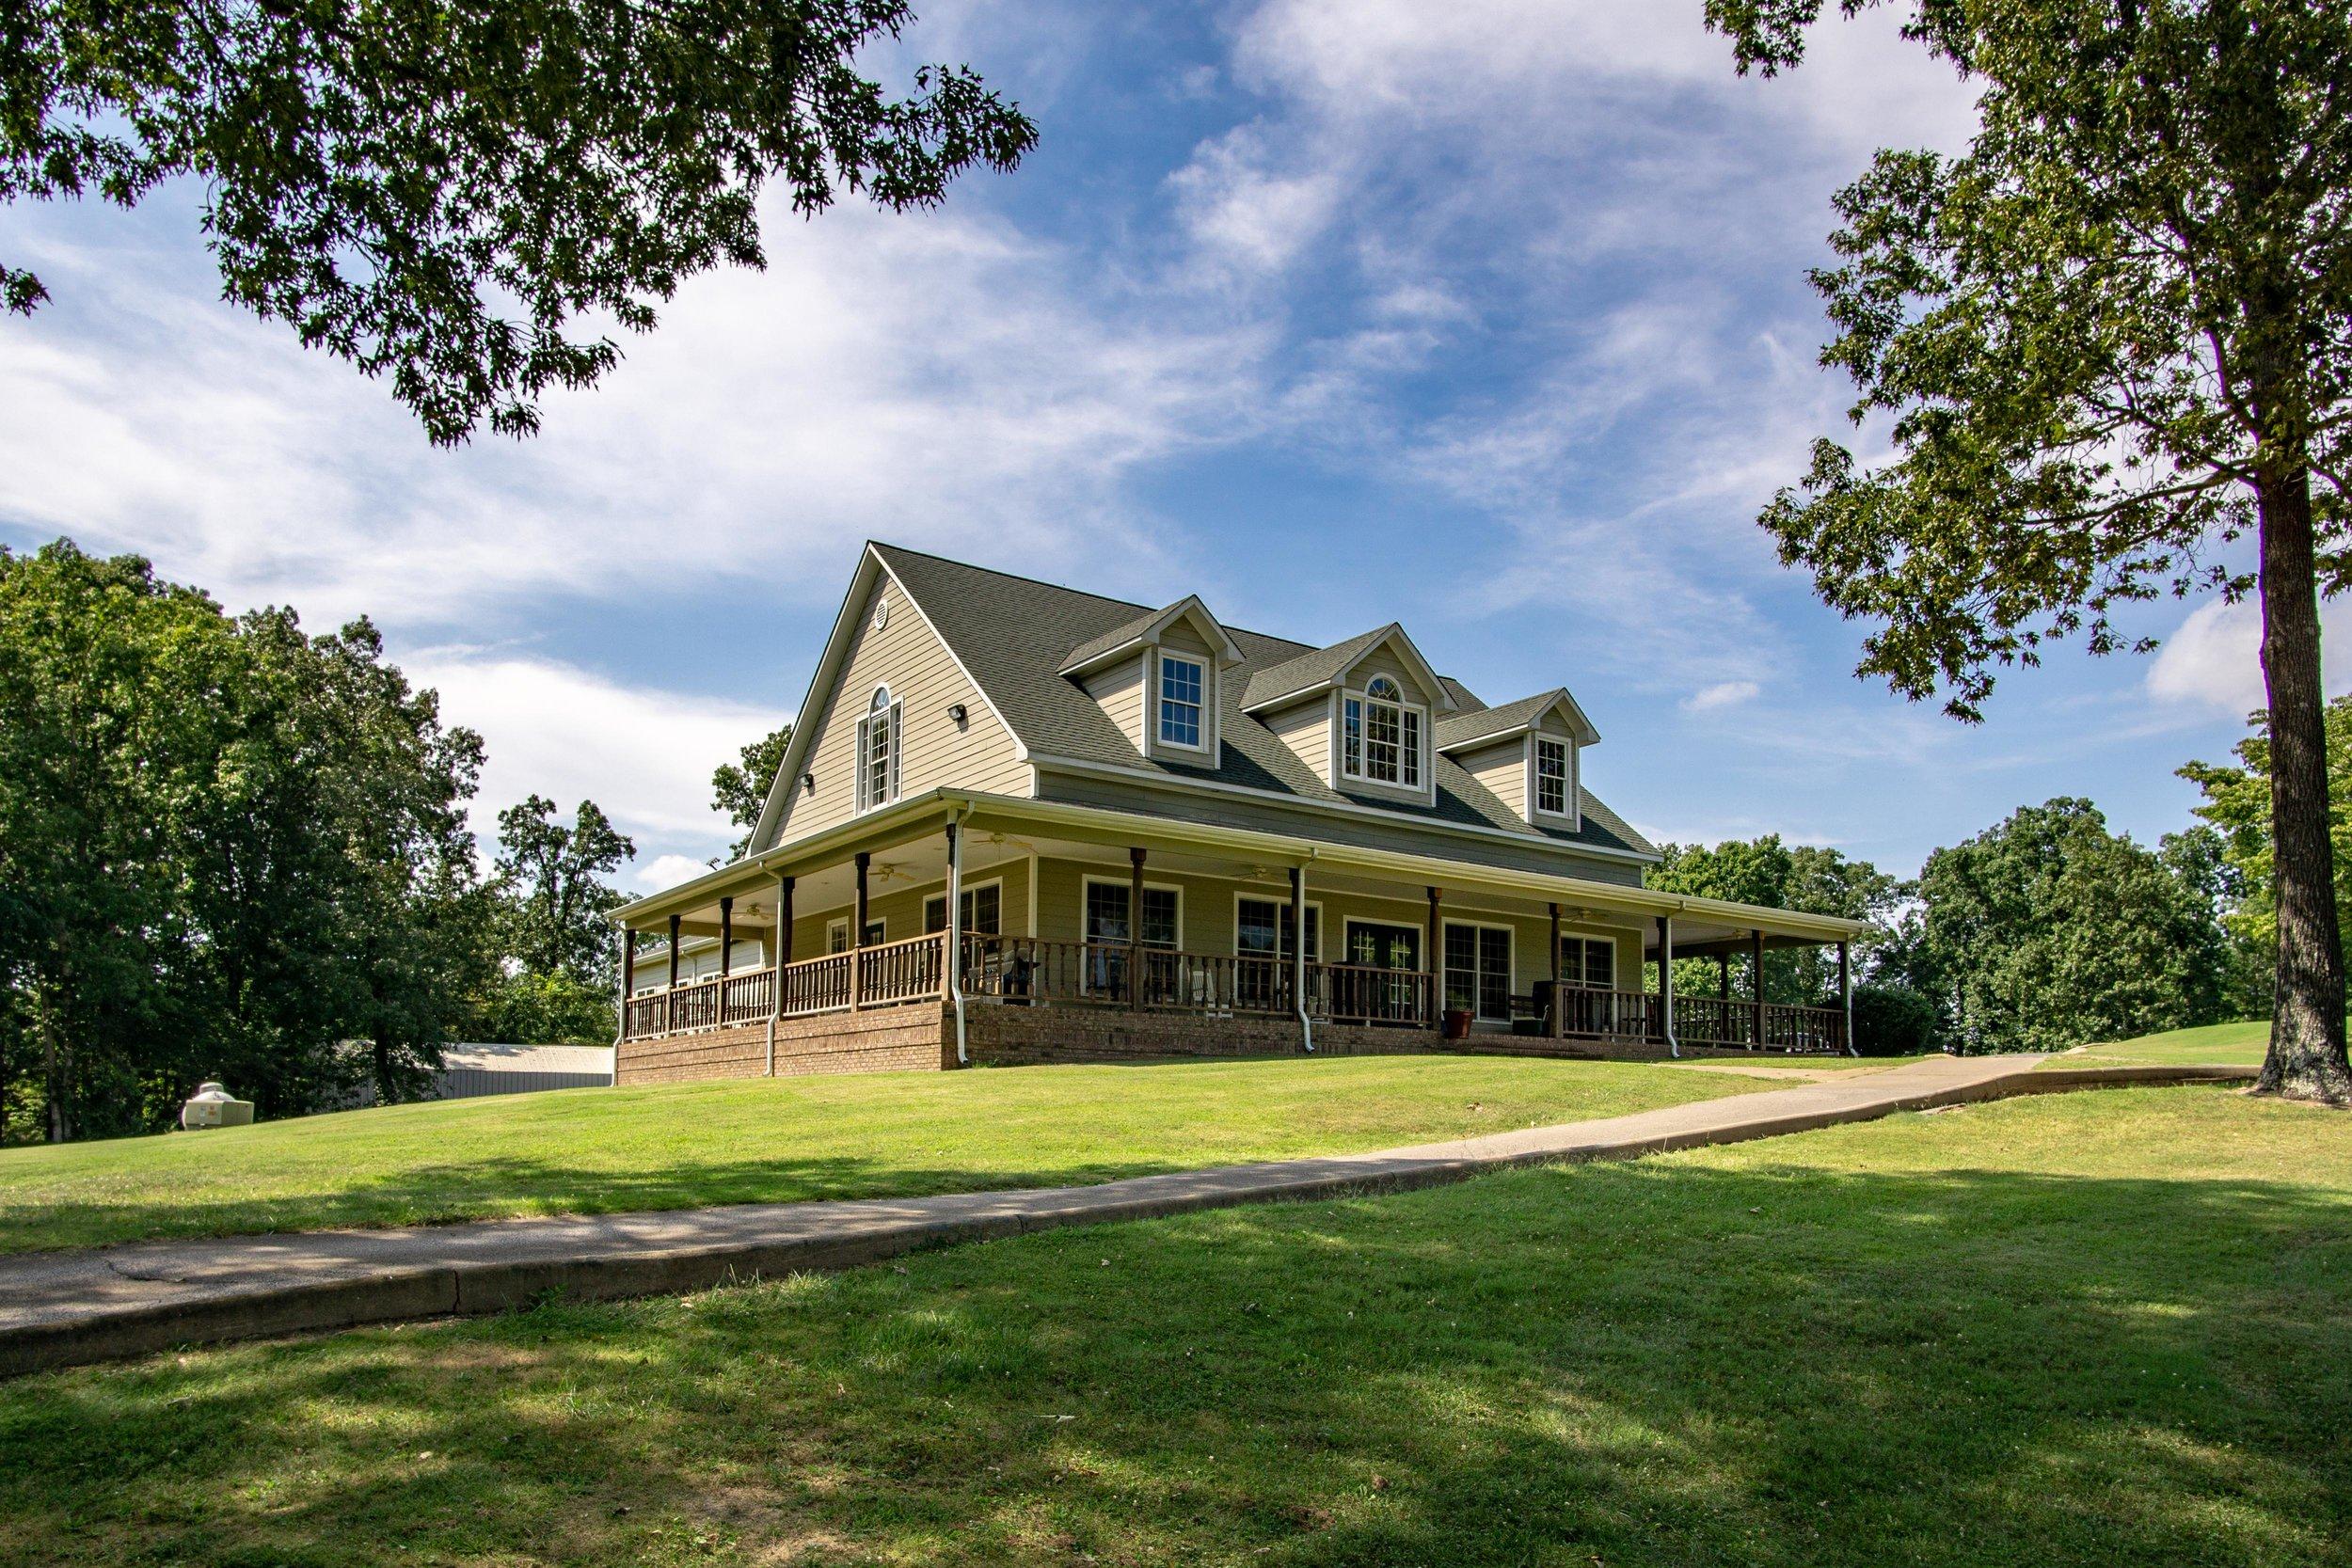 Dixie Oaks Golf Club Summertown TN Real Estate Photographer Pro -10.jpg